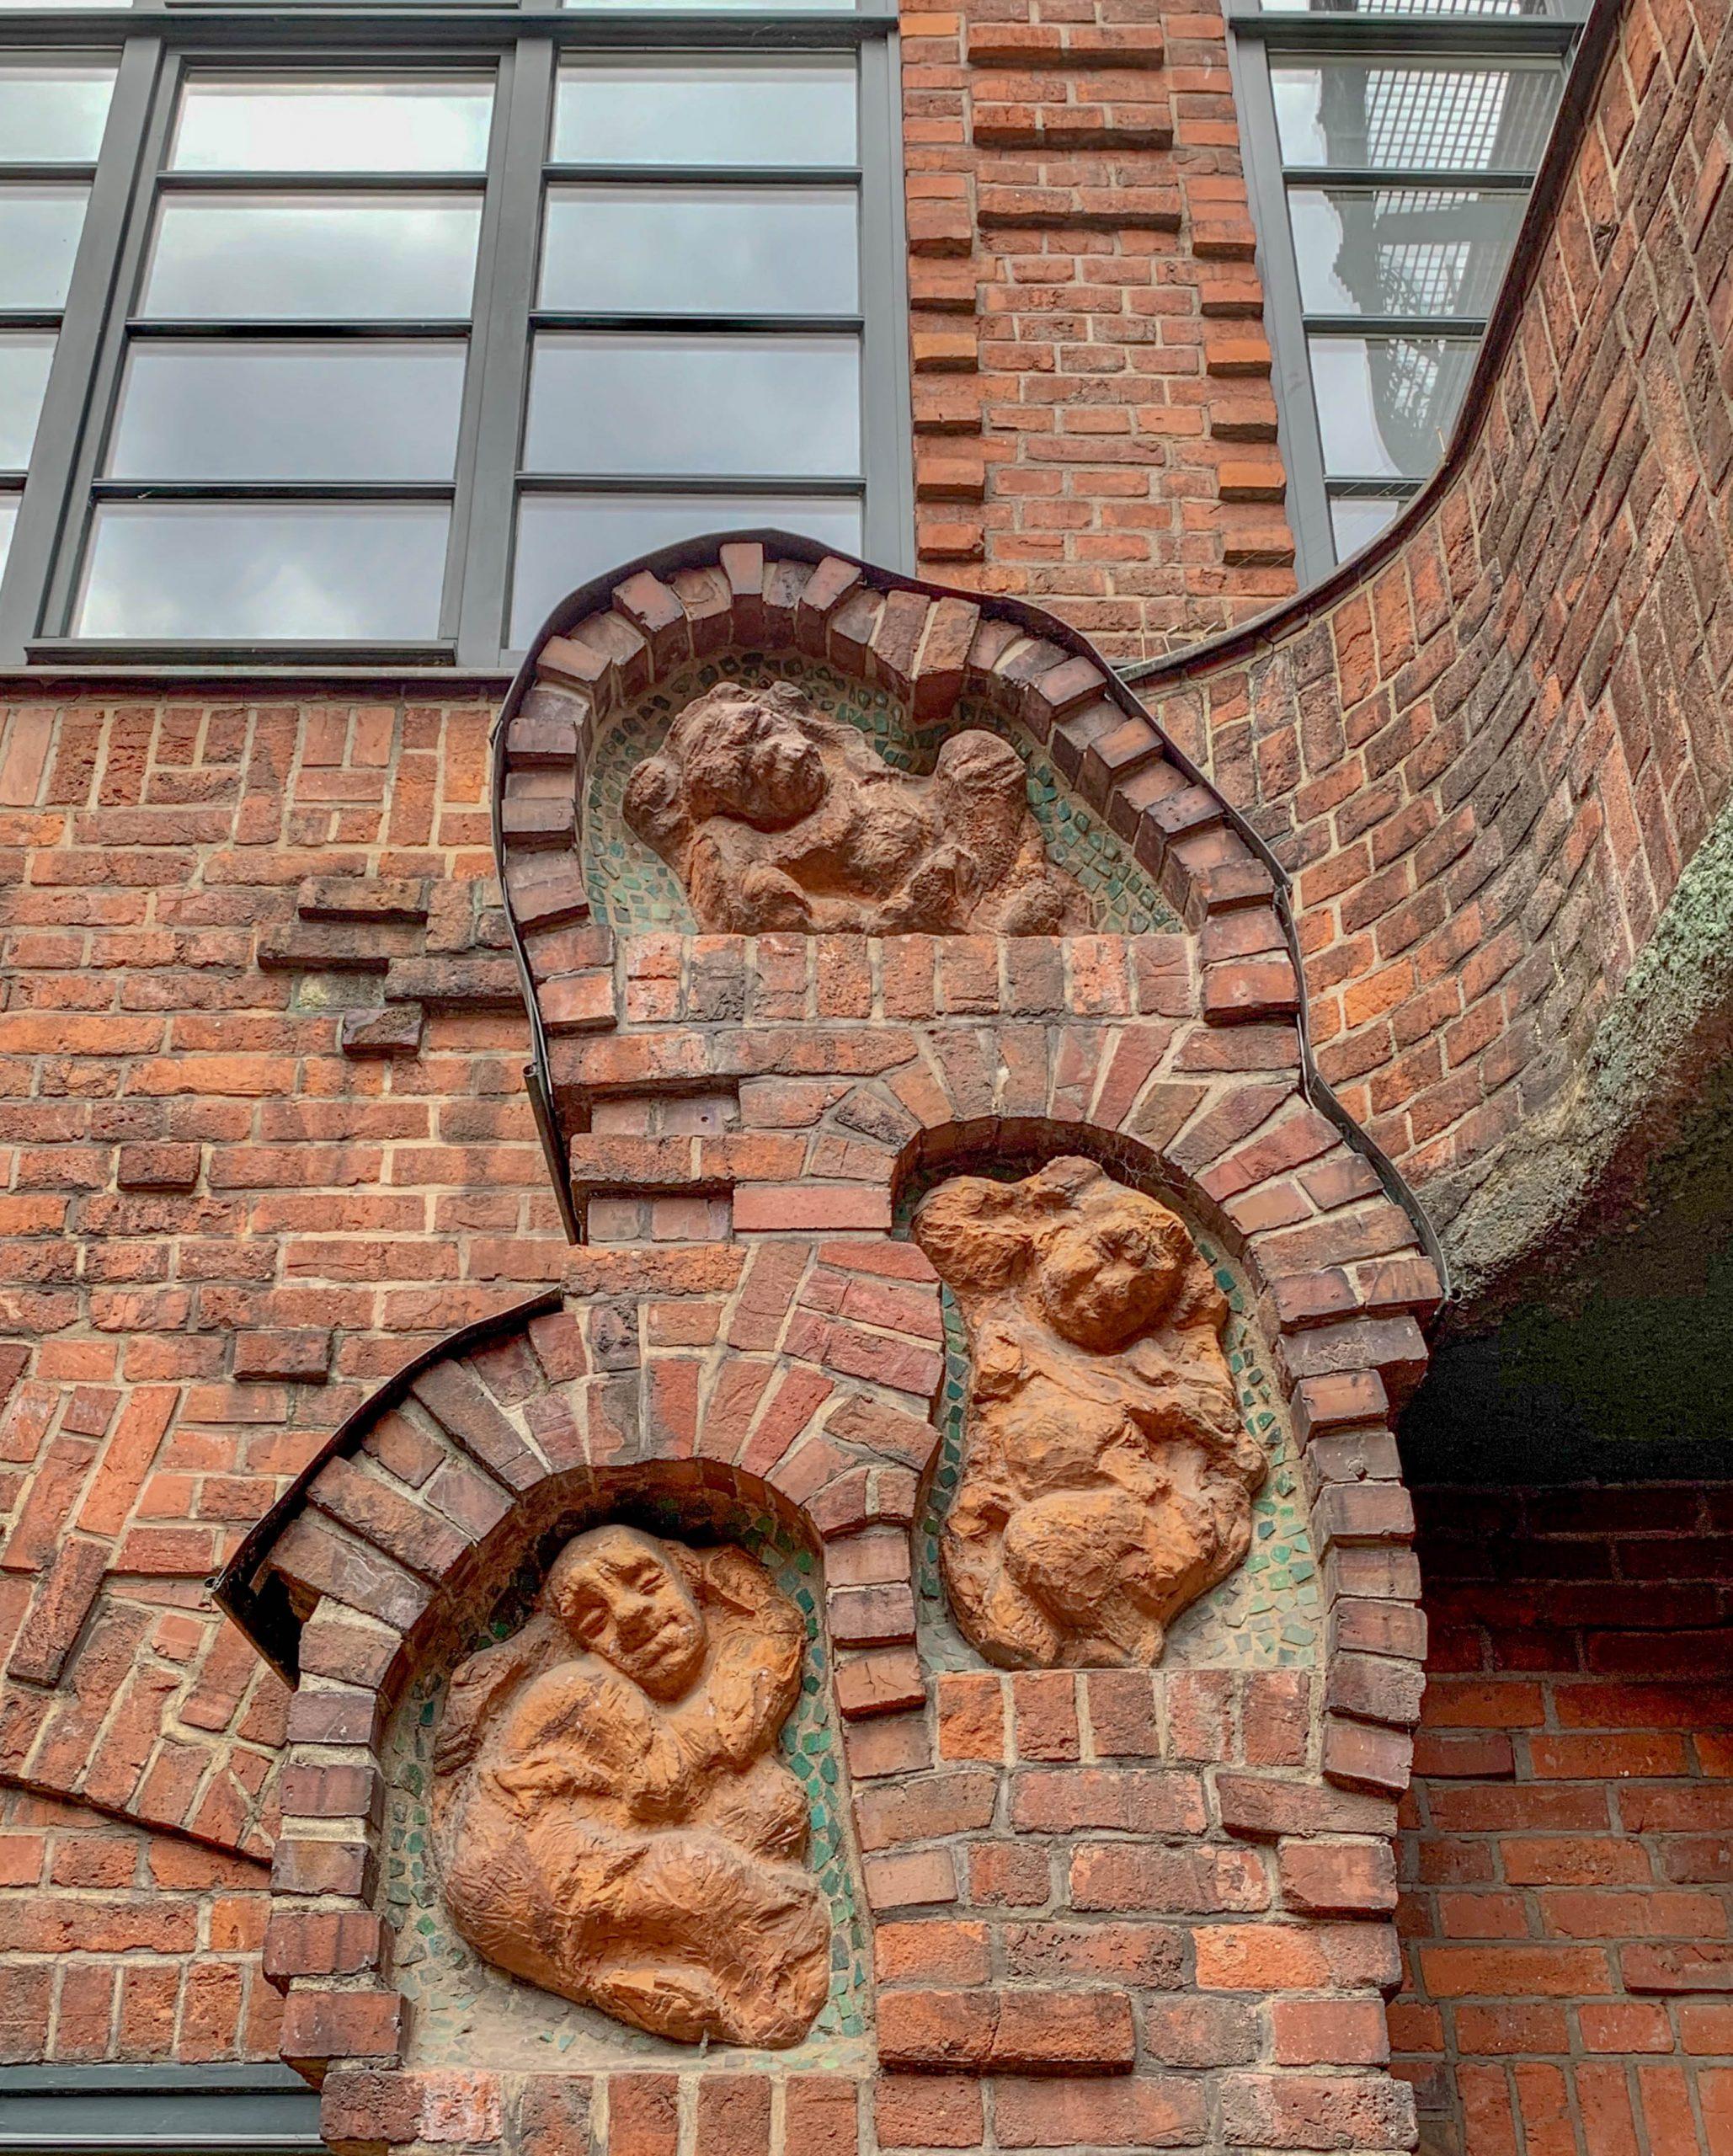 Böttcherstraße, 1922-1931. Entwurf: Bernhard Hoetger, Alfred Runge, Eduard Scotland